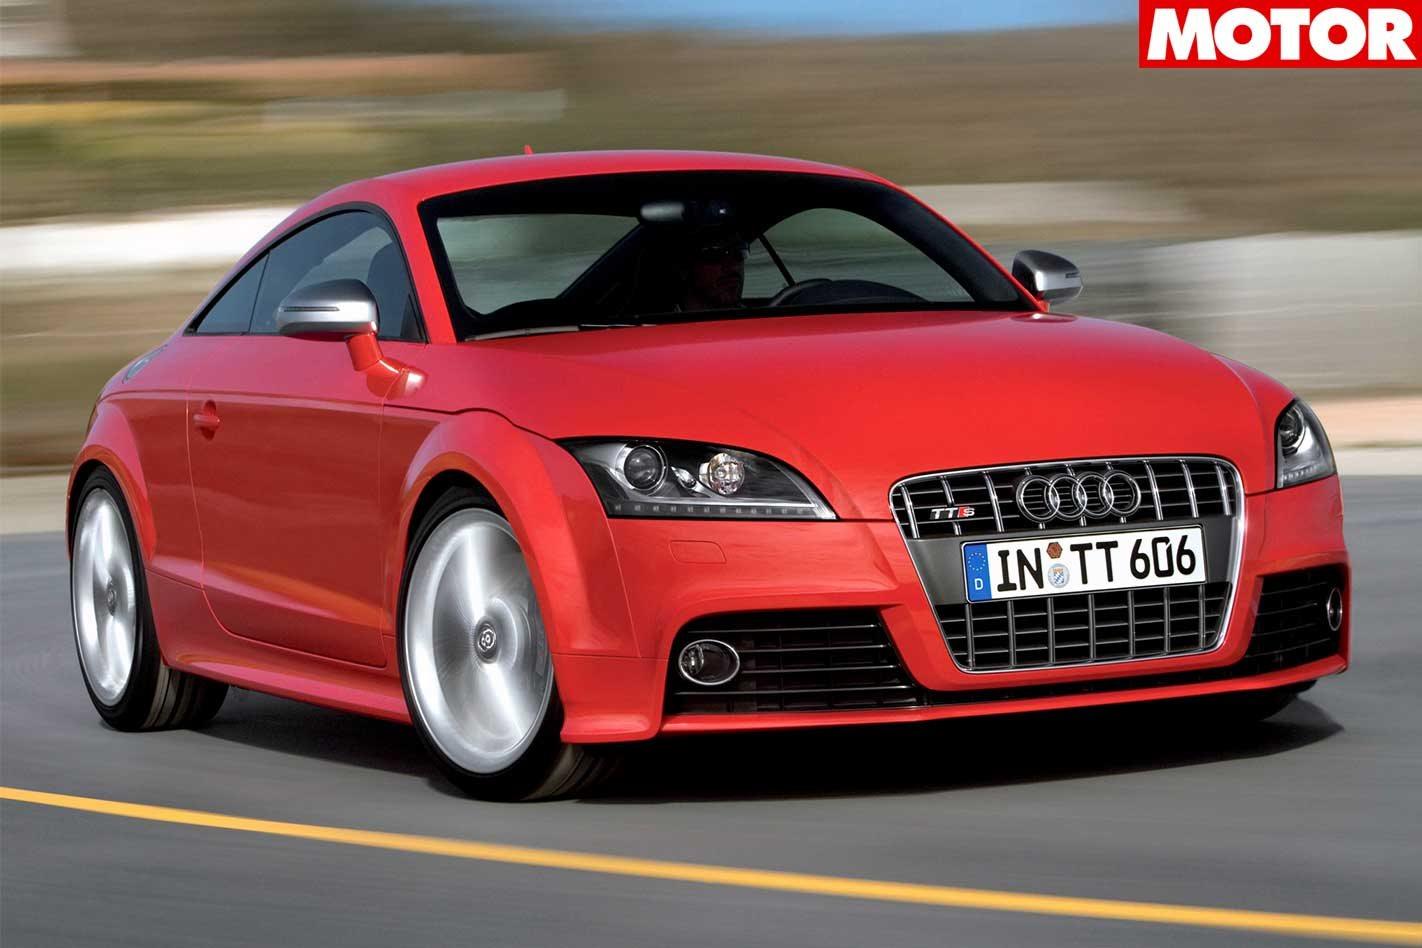 Kekurangan Audi Tts 2008 Top Model Tahun Ini